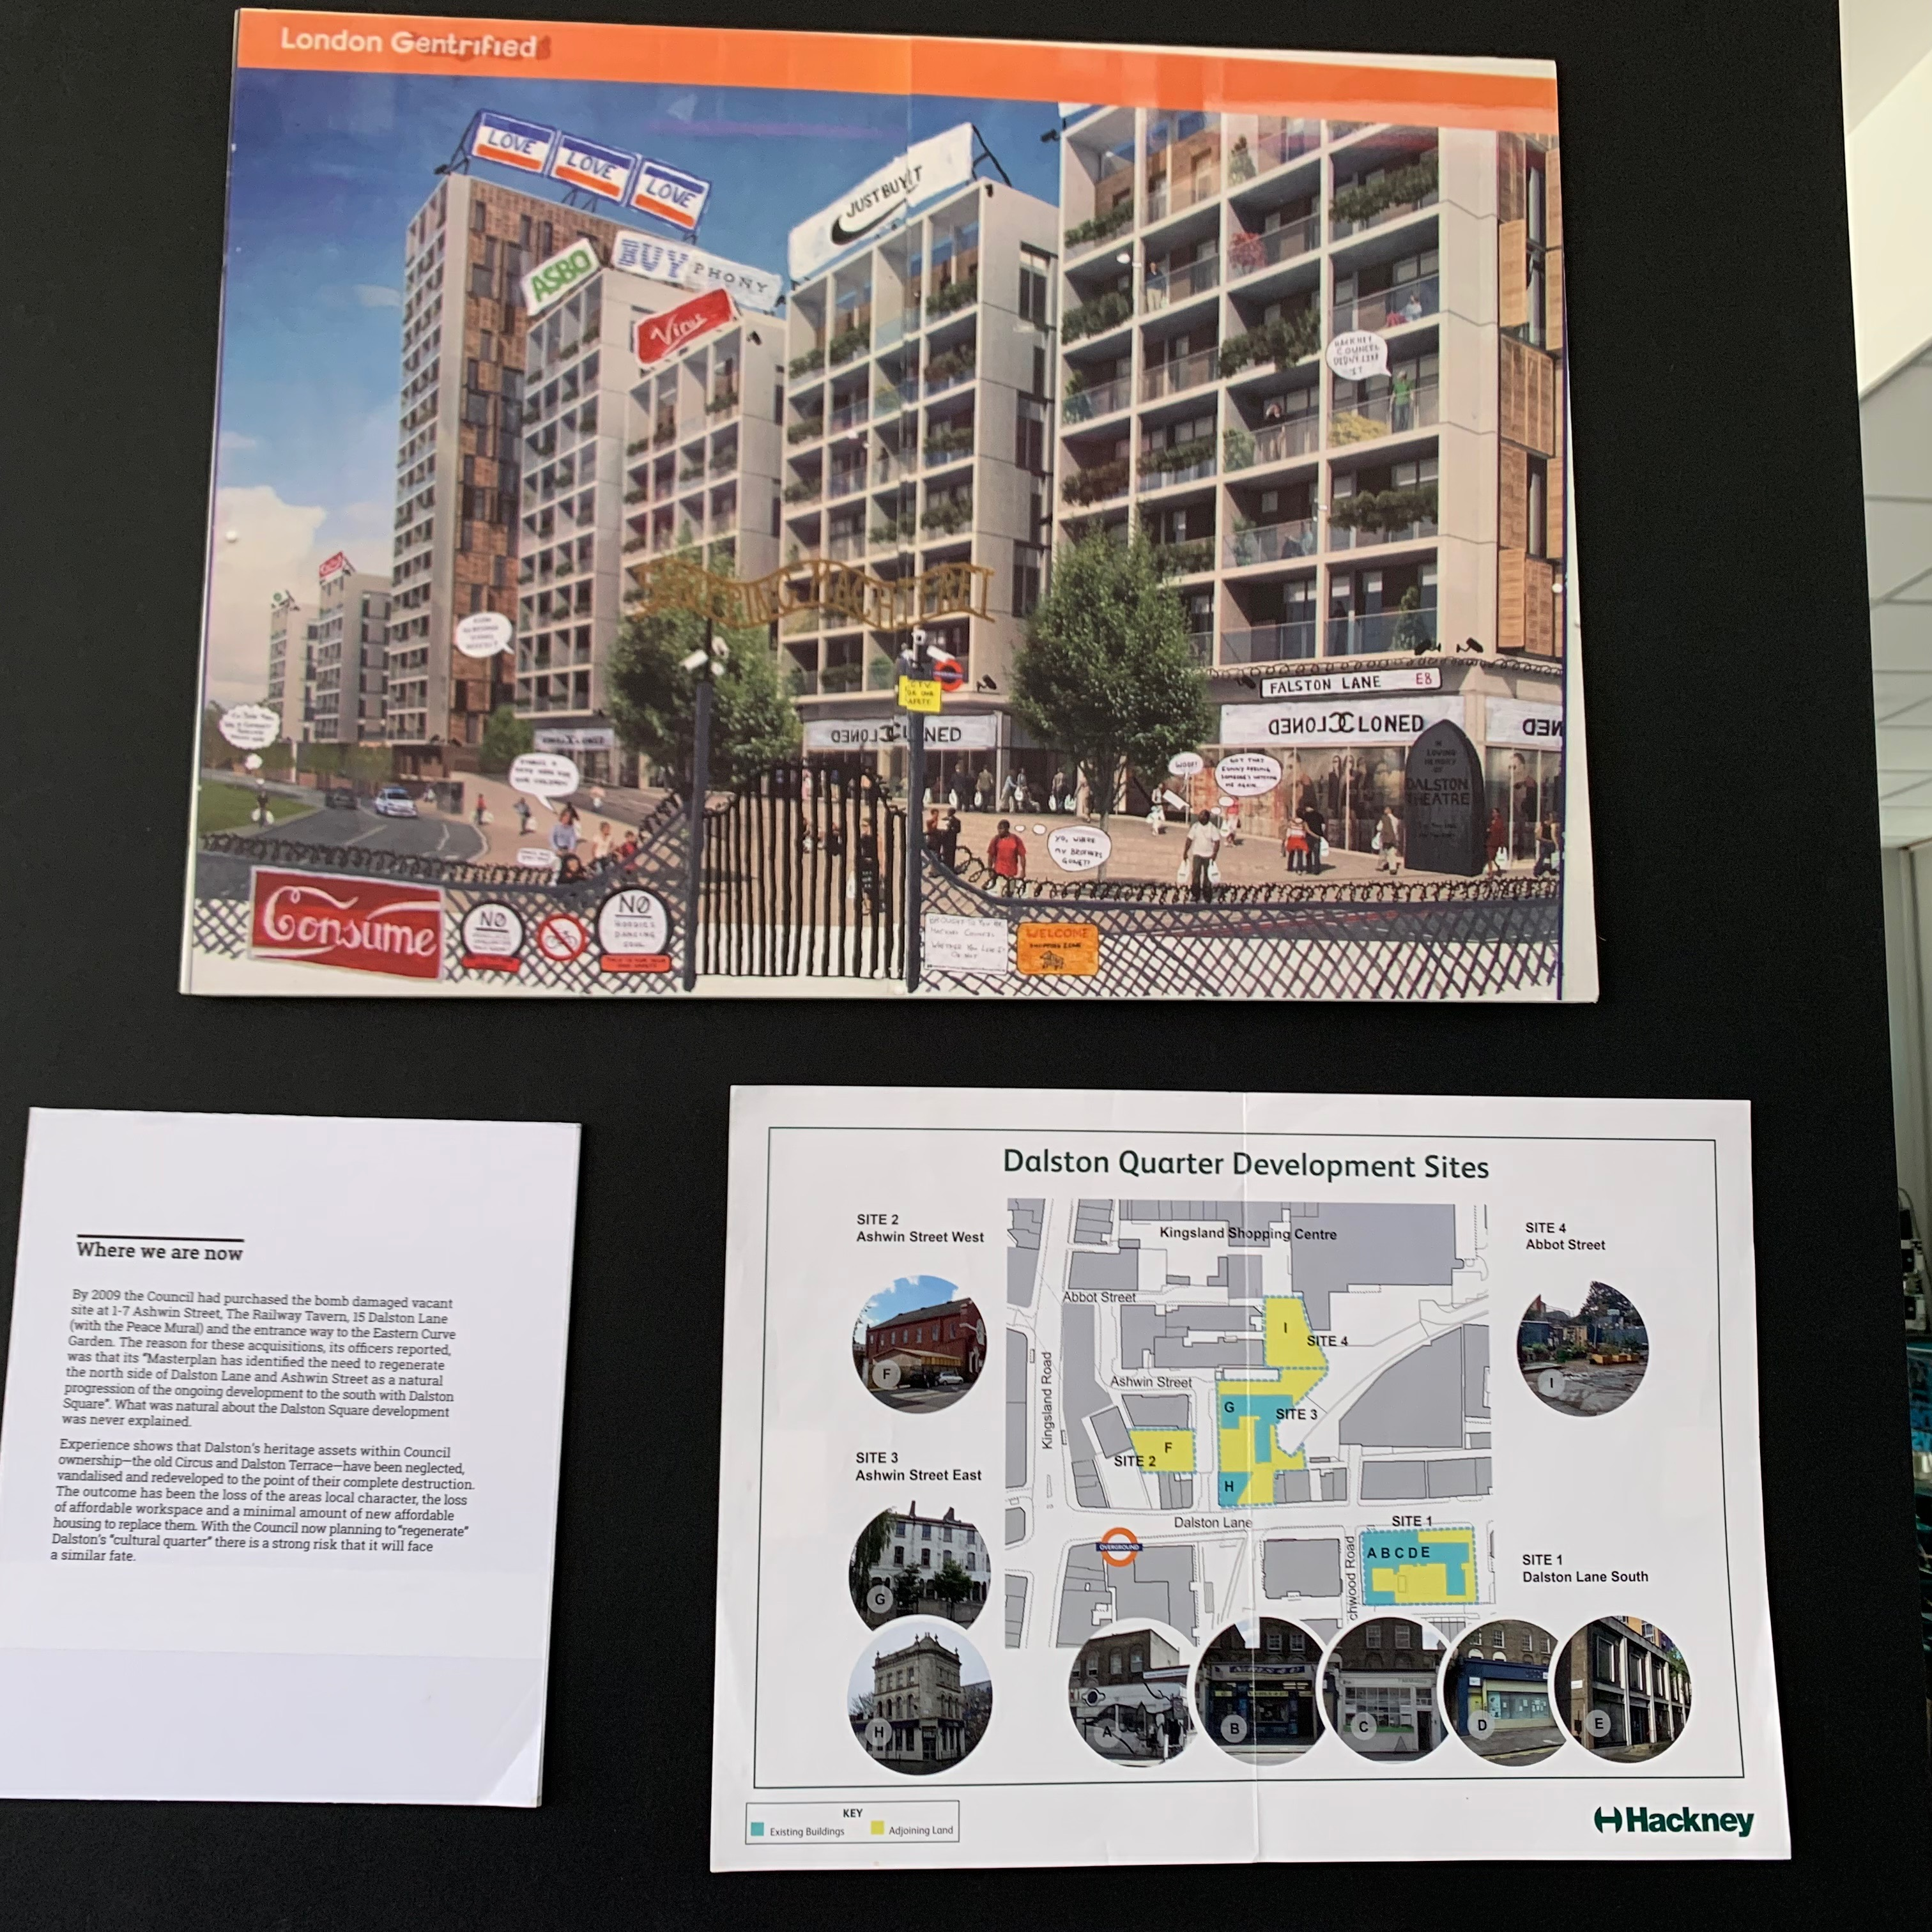 Dalston Quarter Development Sites